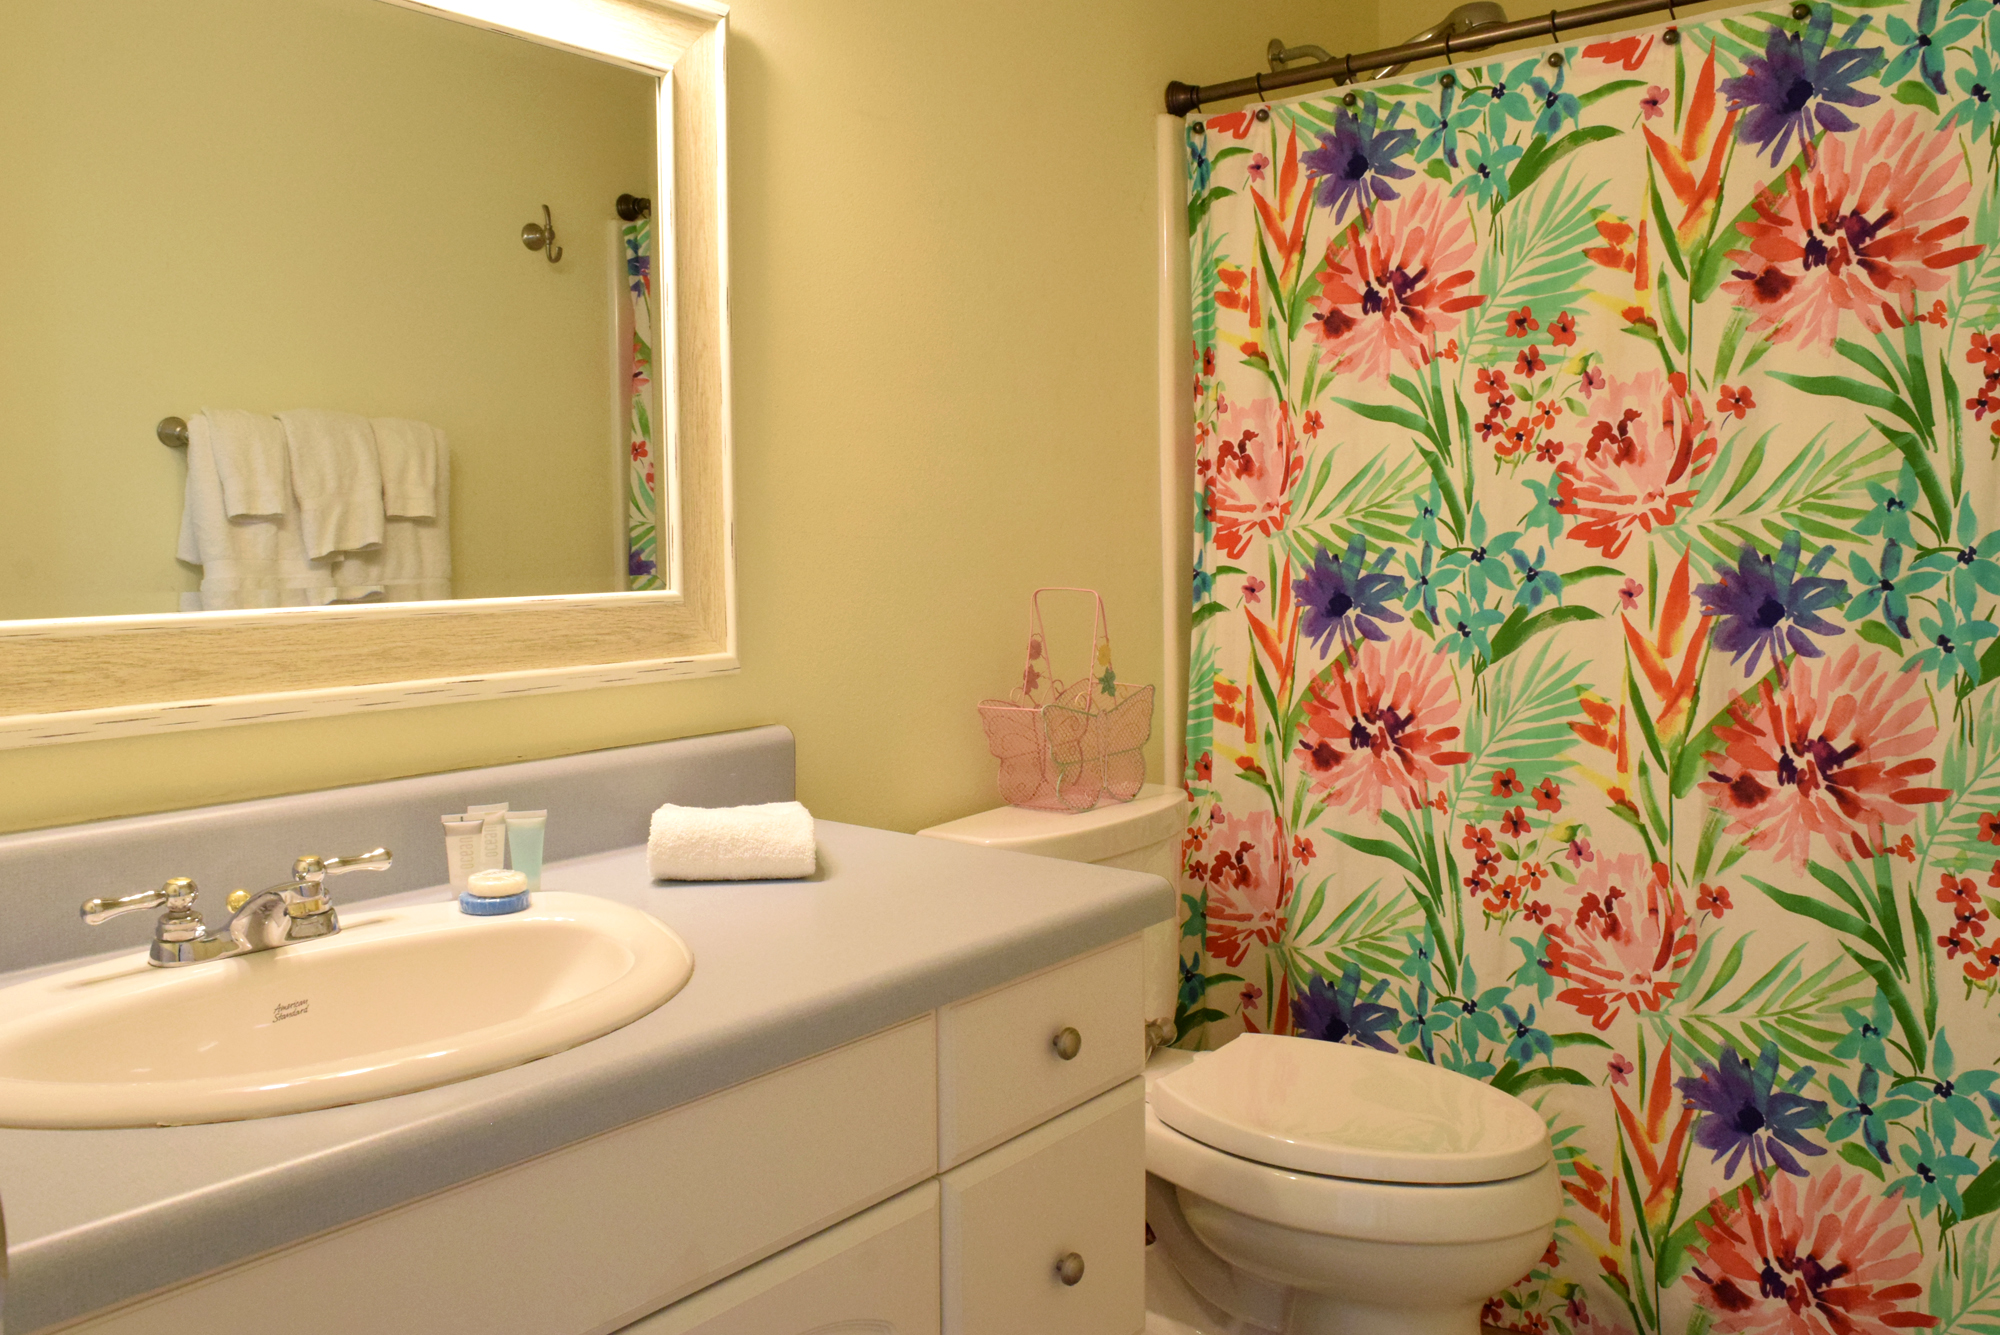 Maldonado 1103 House/Cottage rental in Pensacola Beach House Rentals in Pensacola Beach Florida - #17